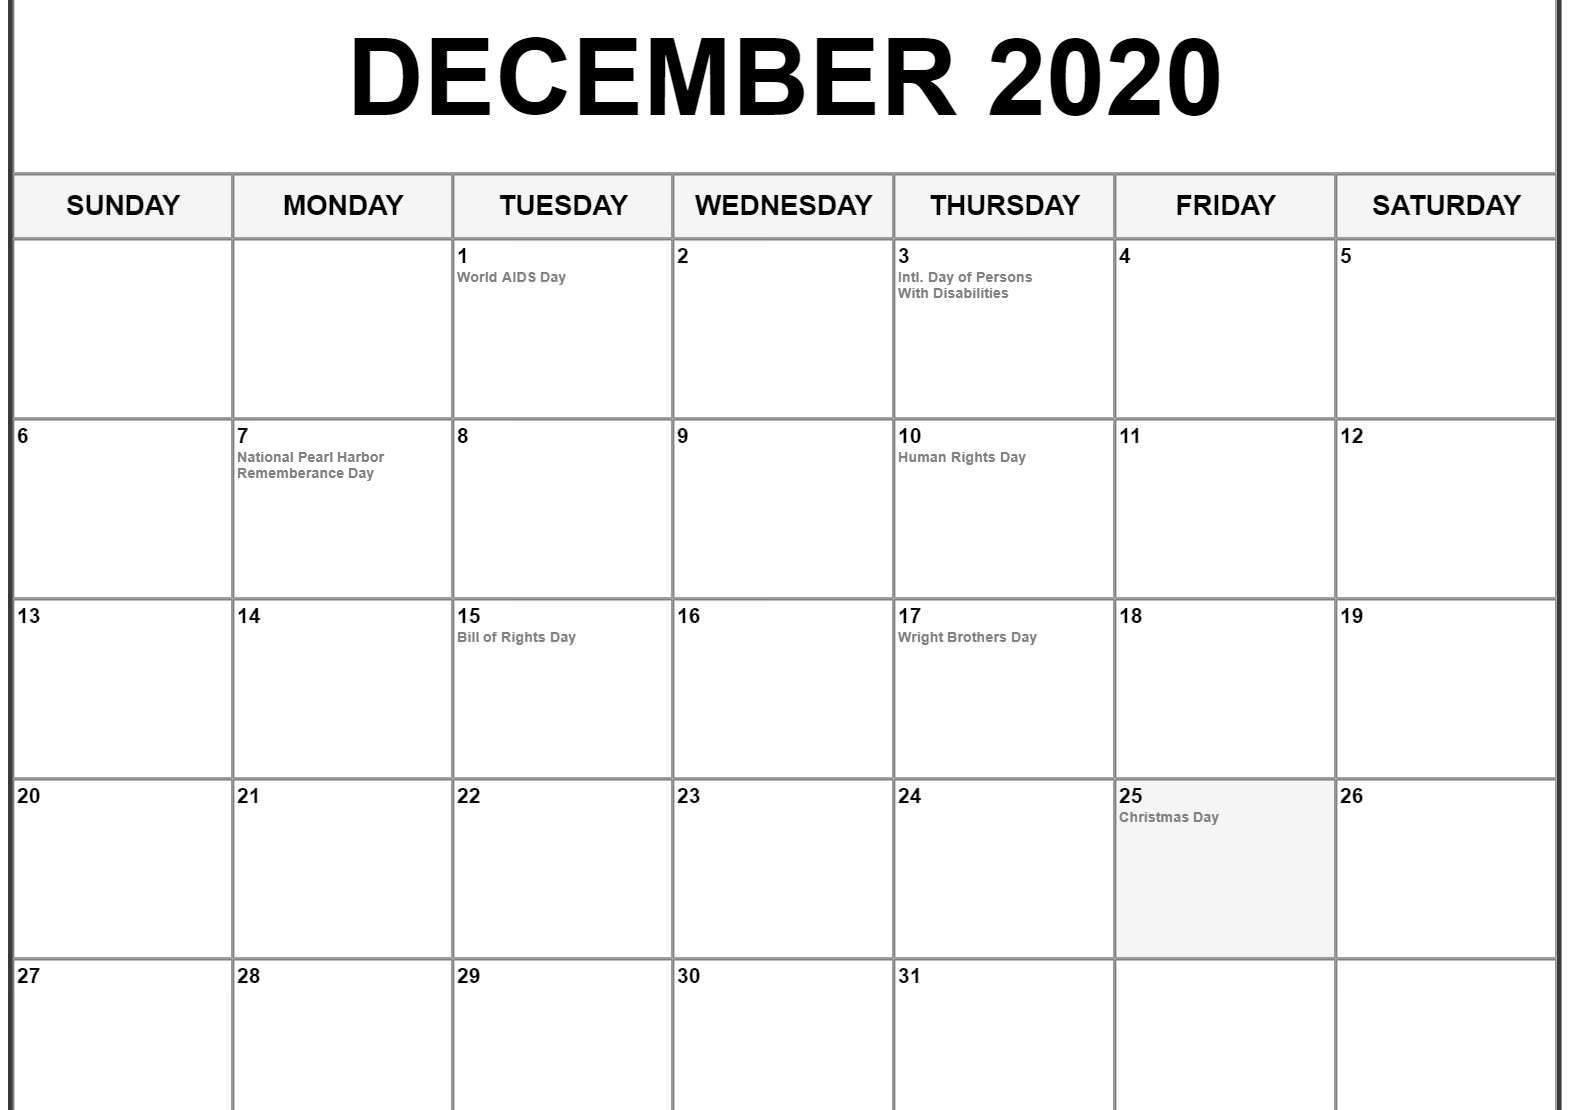 December 2020 Calendar Us Holidays | December Calendar